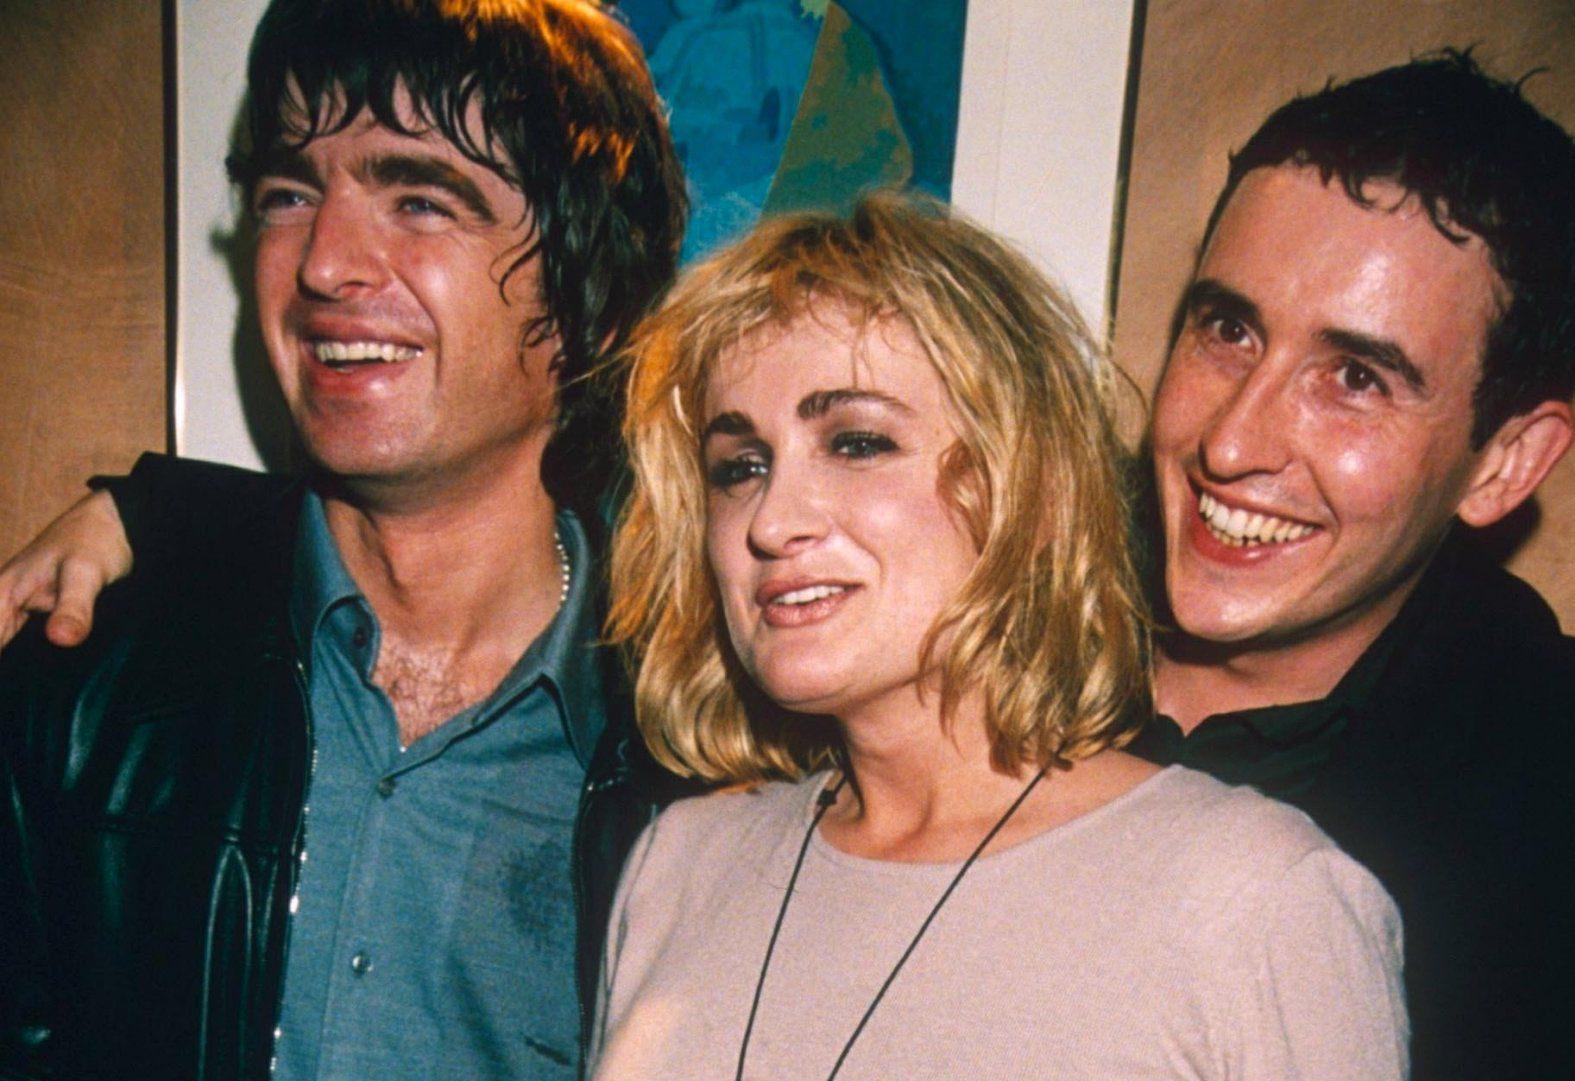 Noel Gallagher dedicates Half The World Away to Caroline Aherne on tour